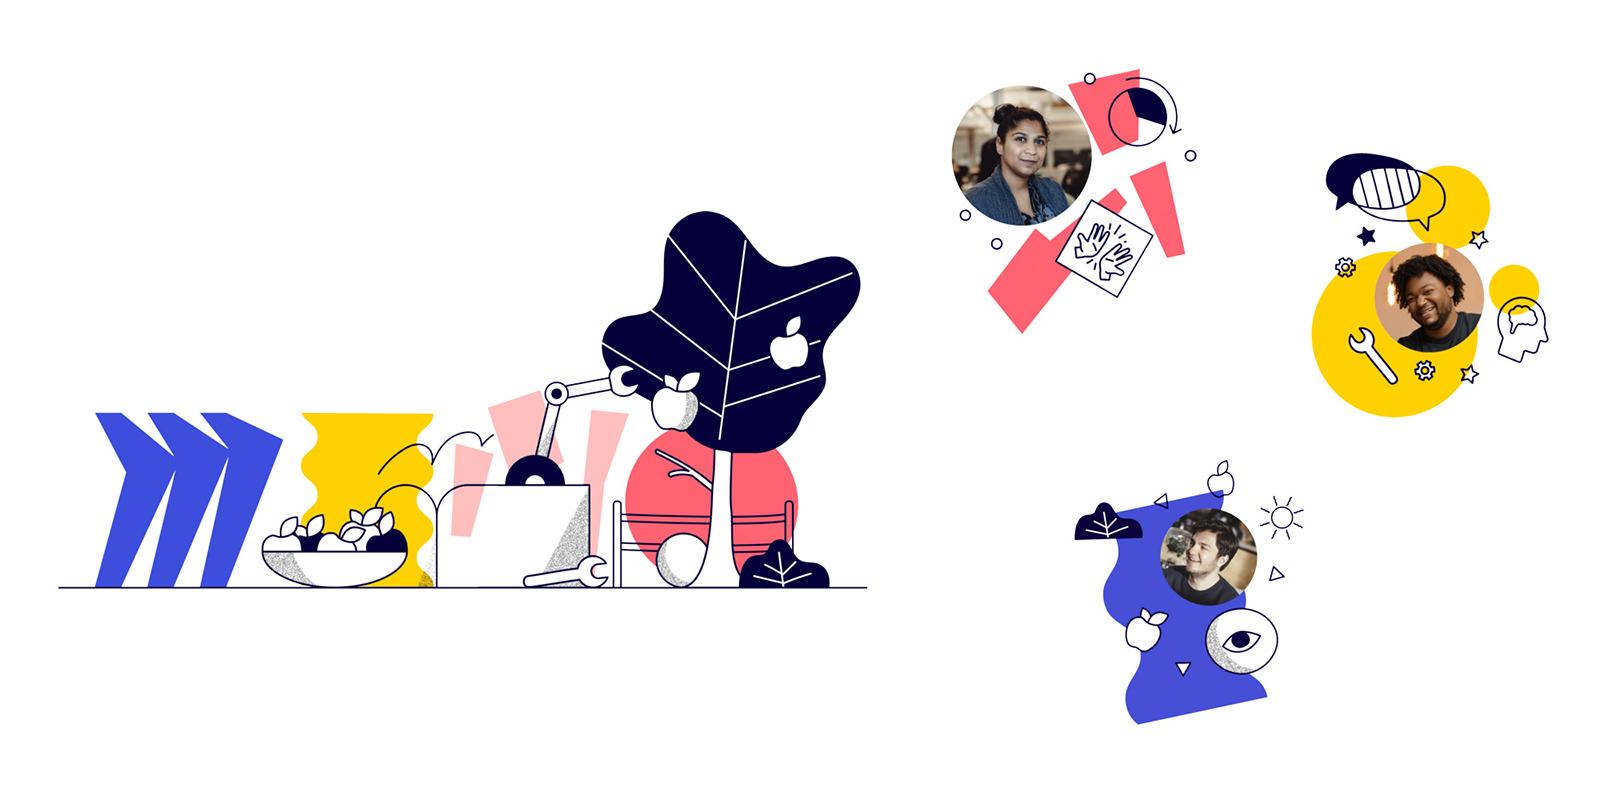 RealtimeBoard更名miro并启用全新的品牌logo和vi形象设计-深圳vi设计8